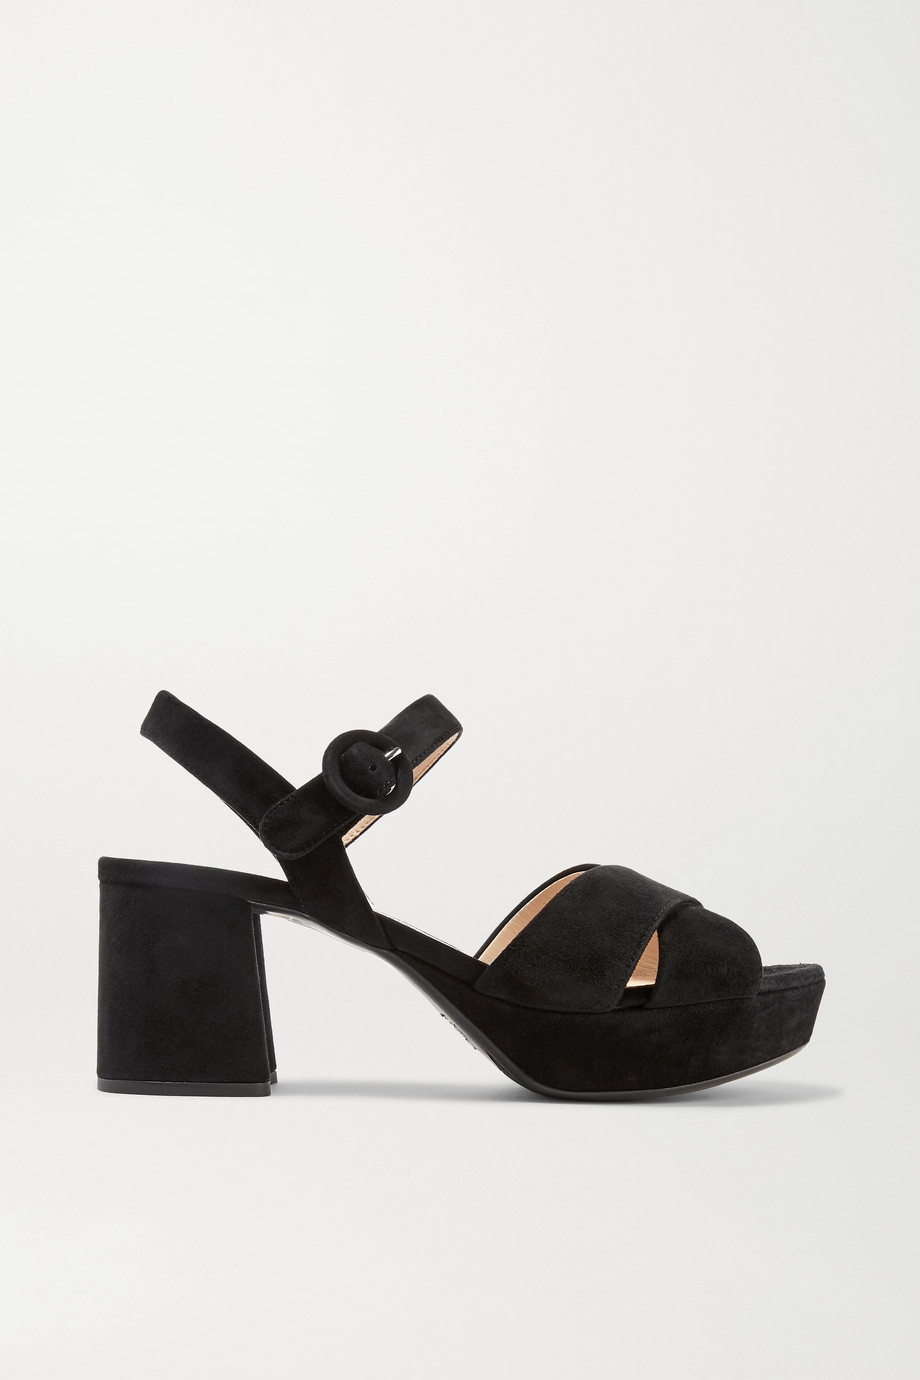 Prada Sandales plates-formes en daim